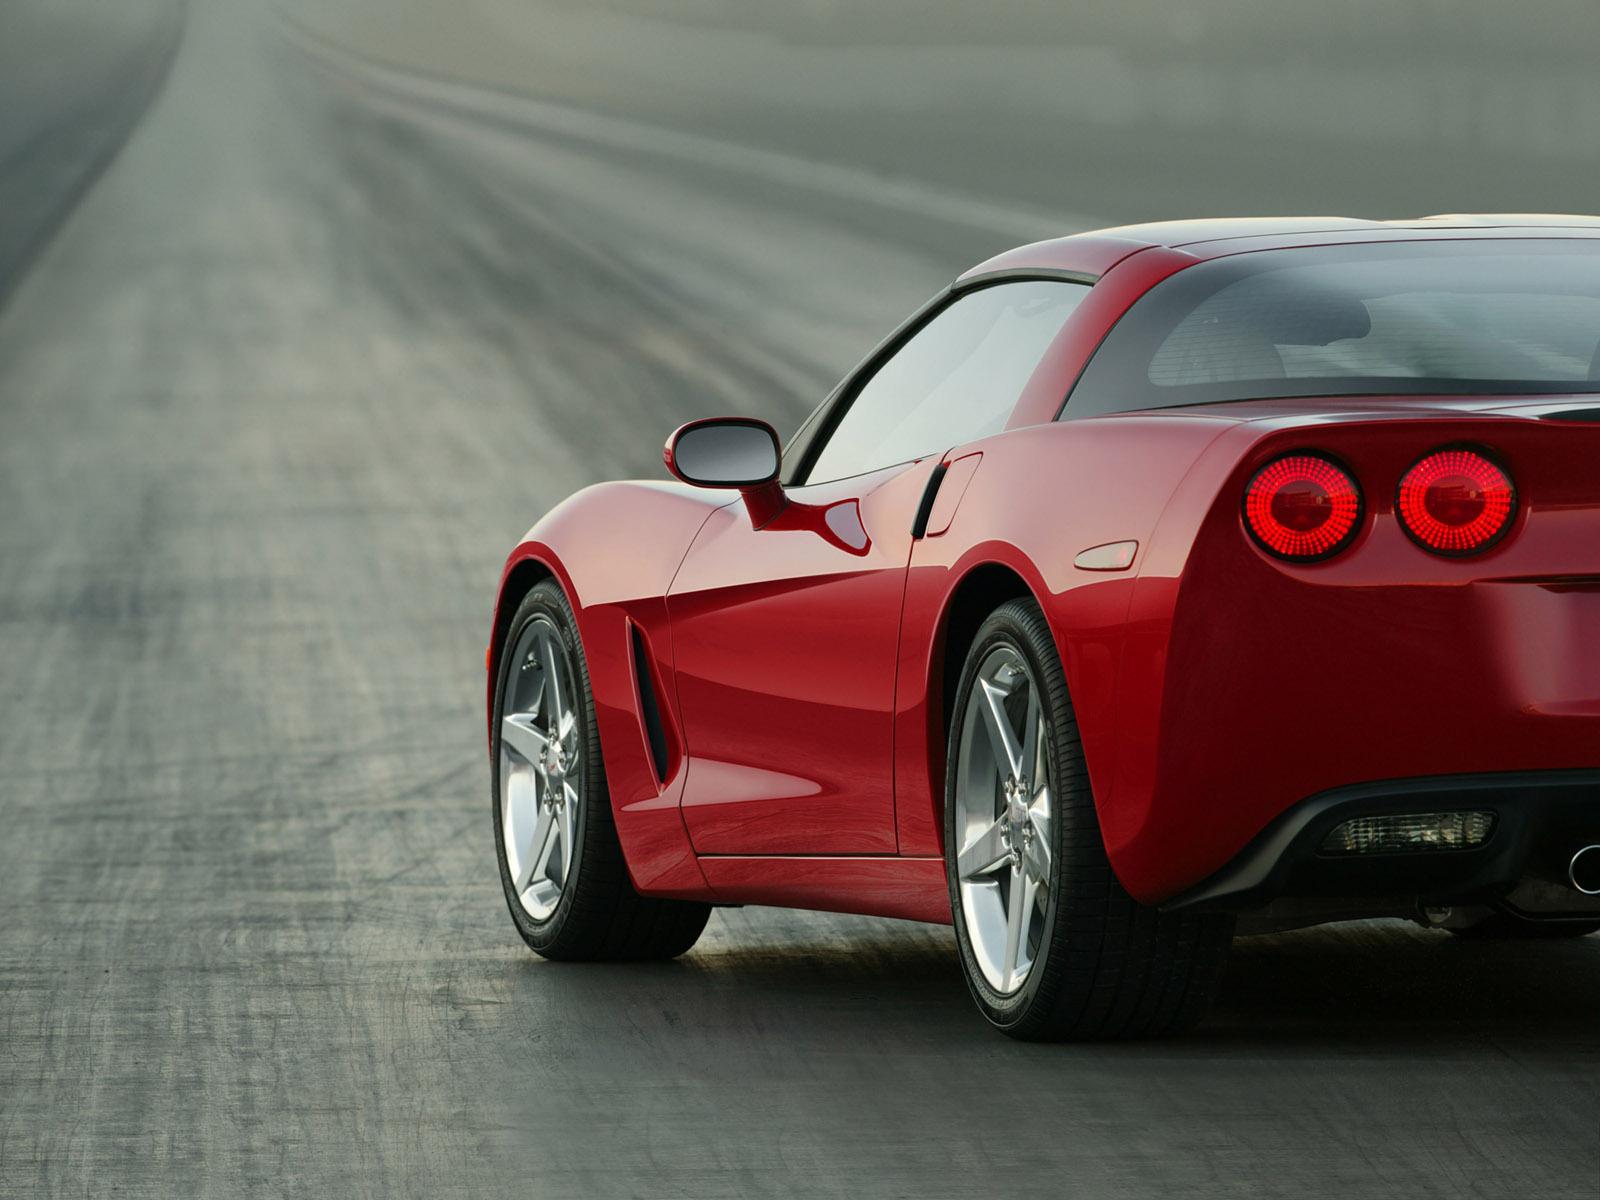 2005-Chevrolet-Corvette-C6-rear-h-1600x1200-1-